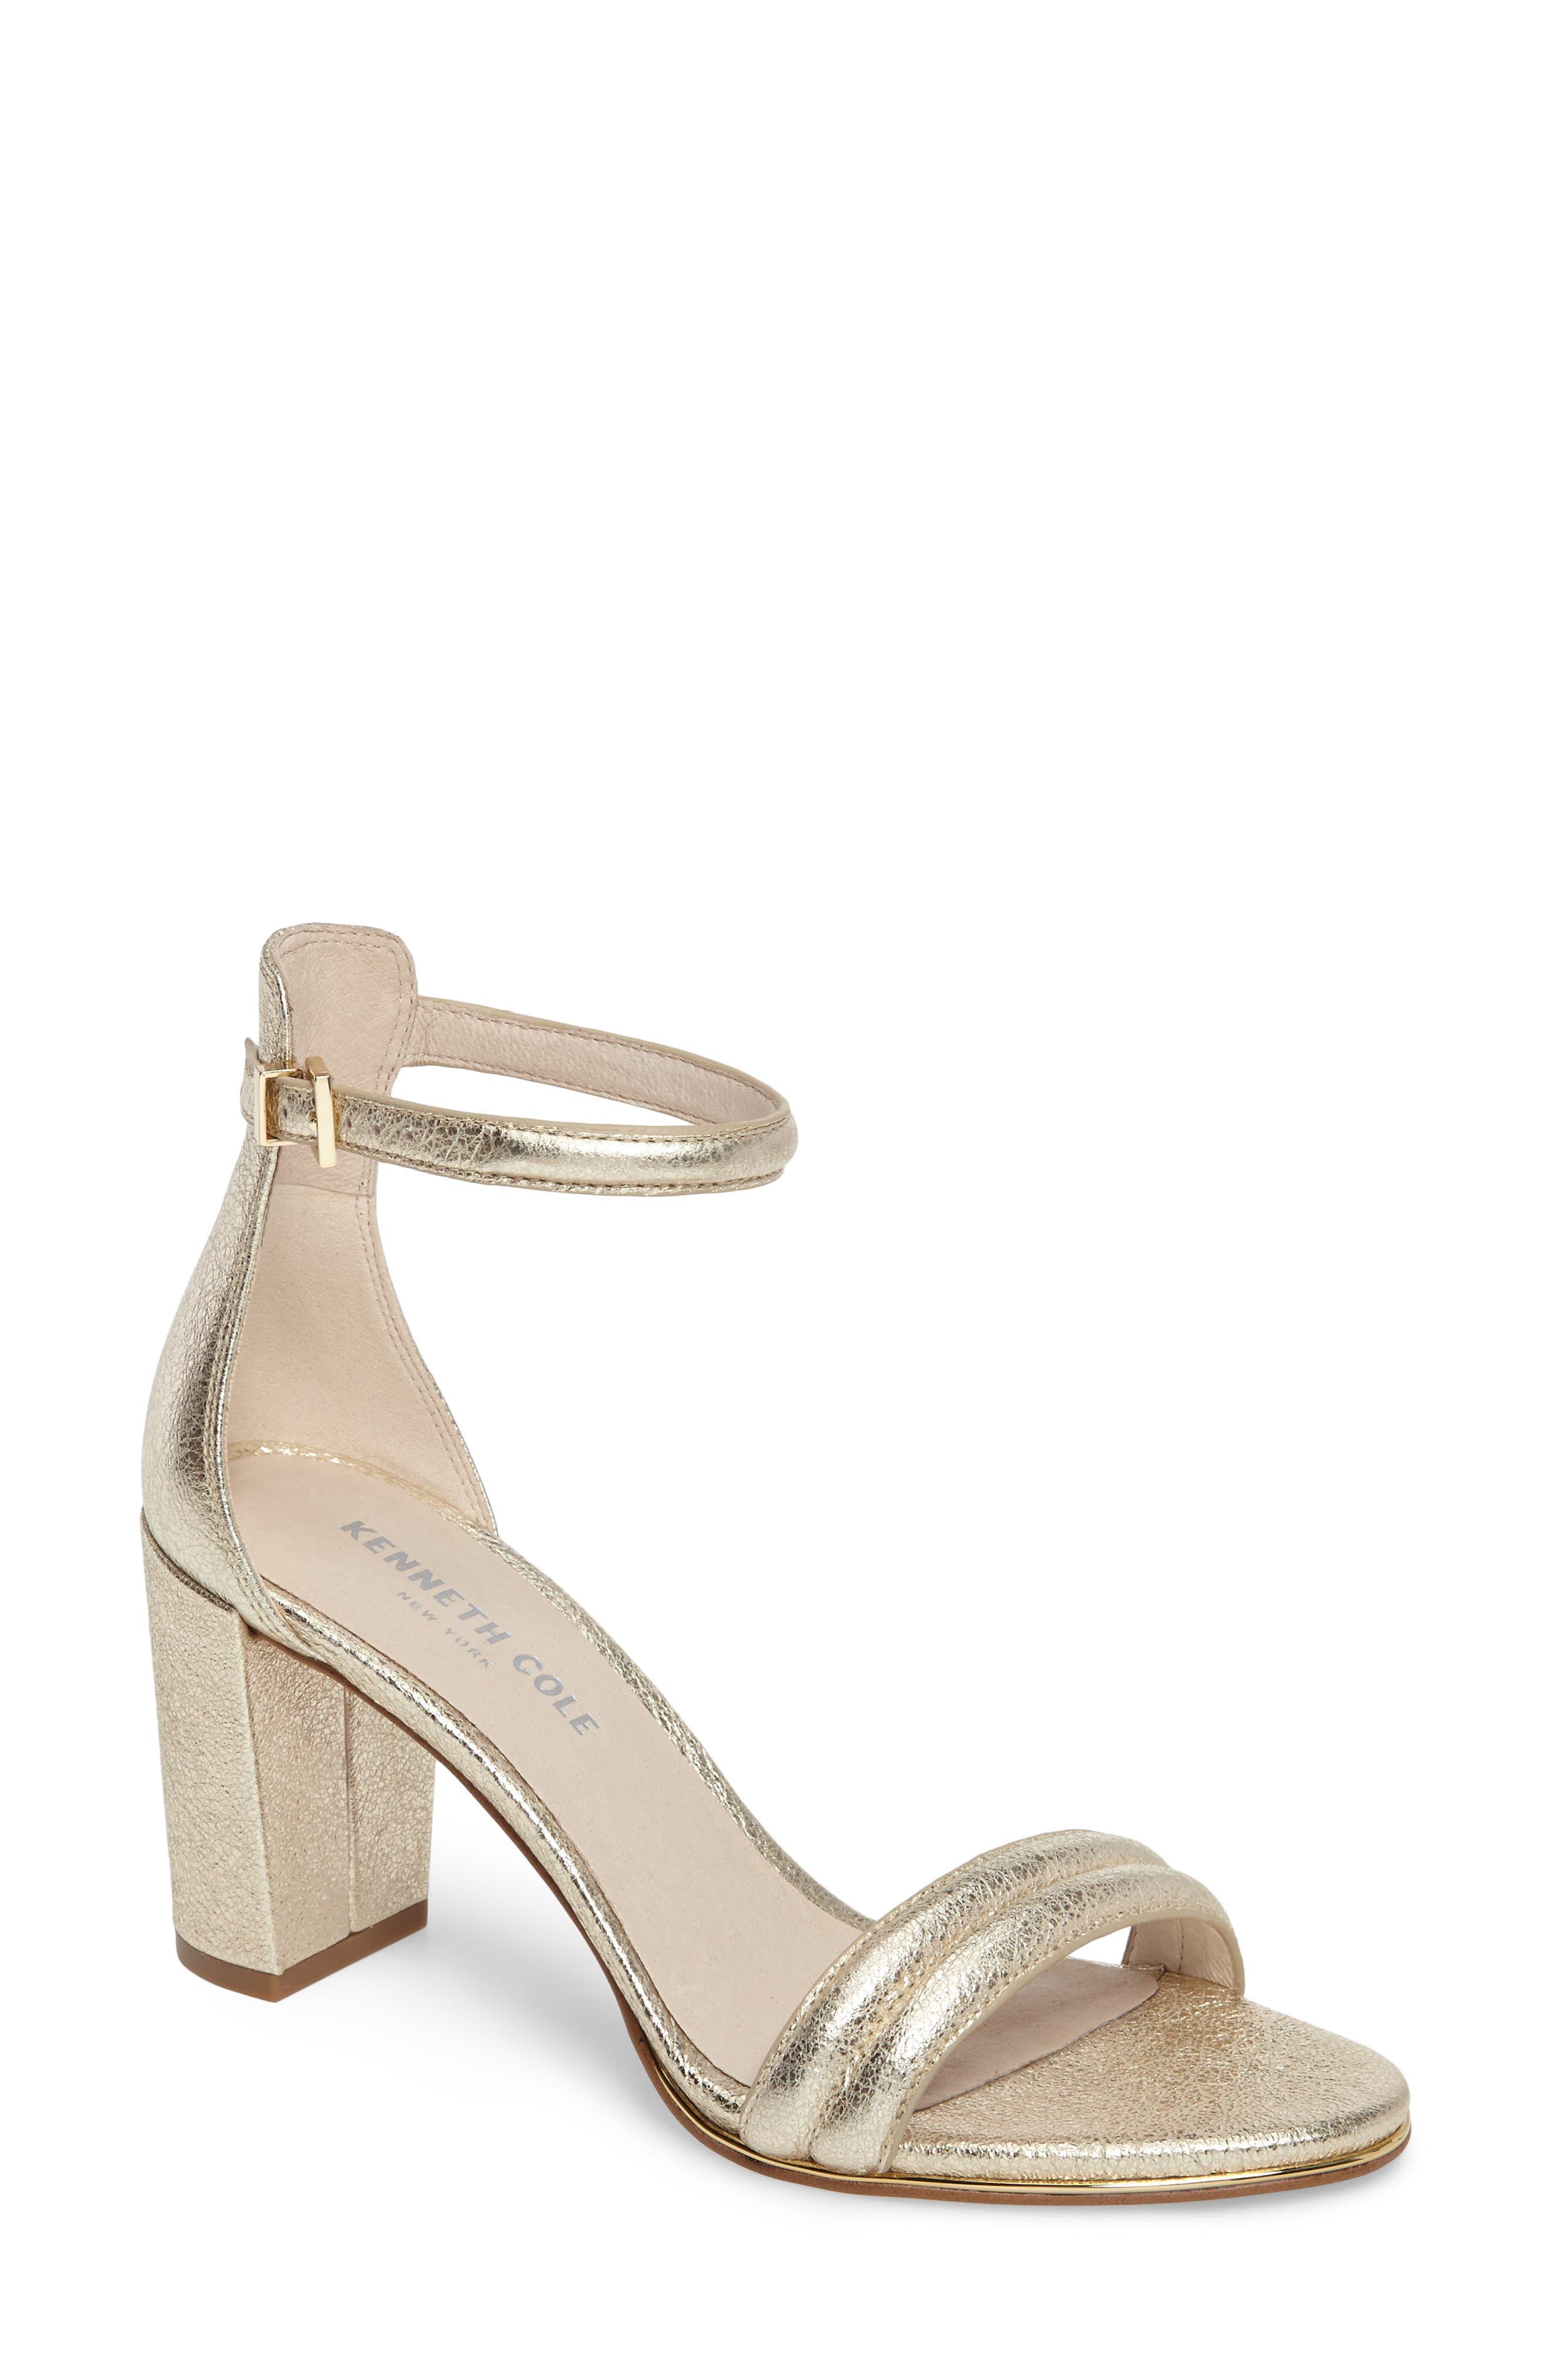 Main Image - Kenneth Cole New York 'Lex' Ankle Strap Sandal (Women)